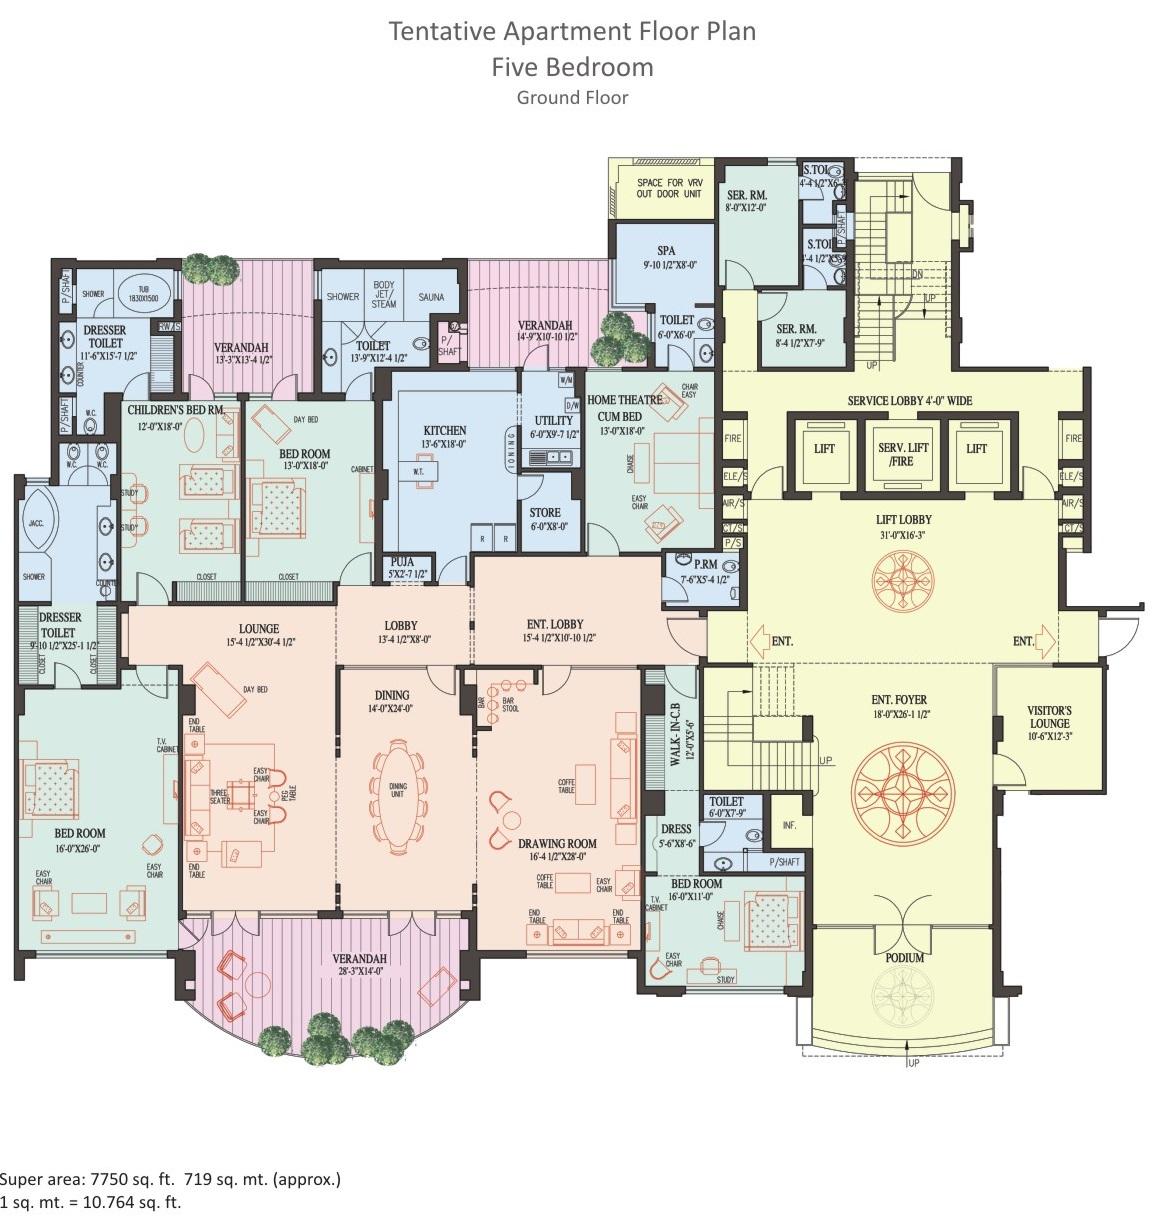 5 BHK Apartment - Ground Floor